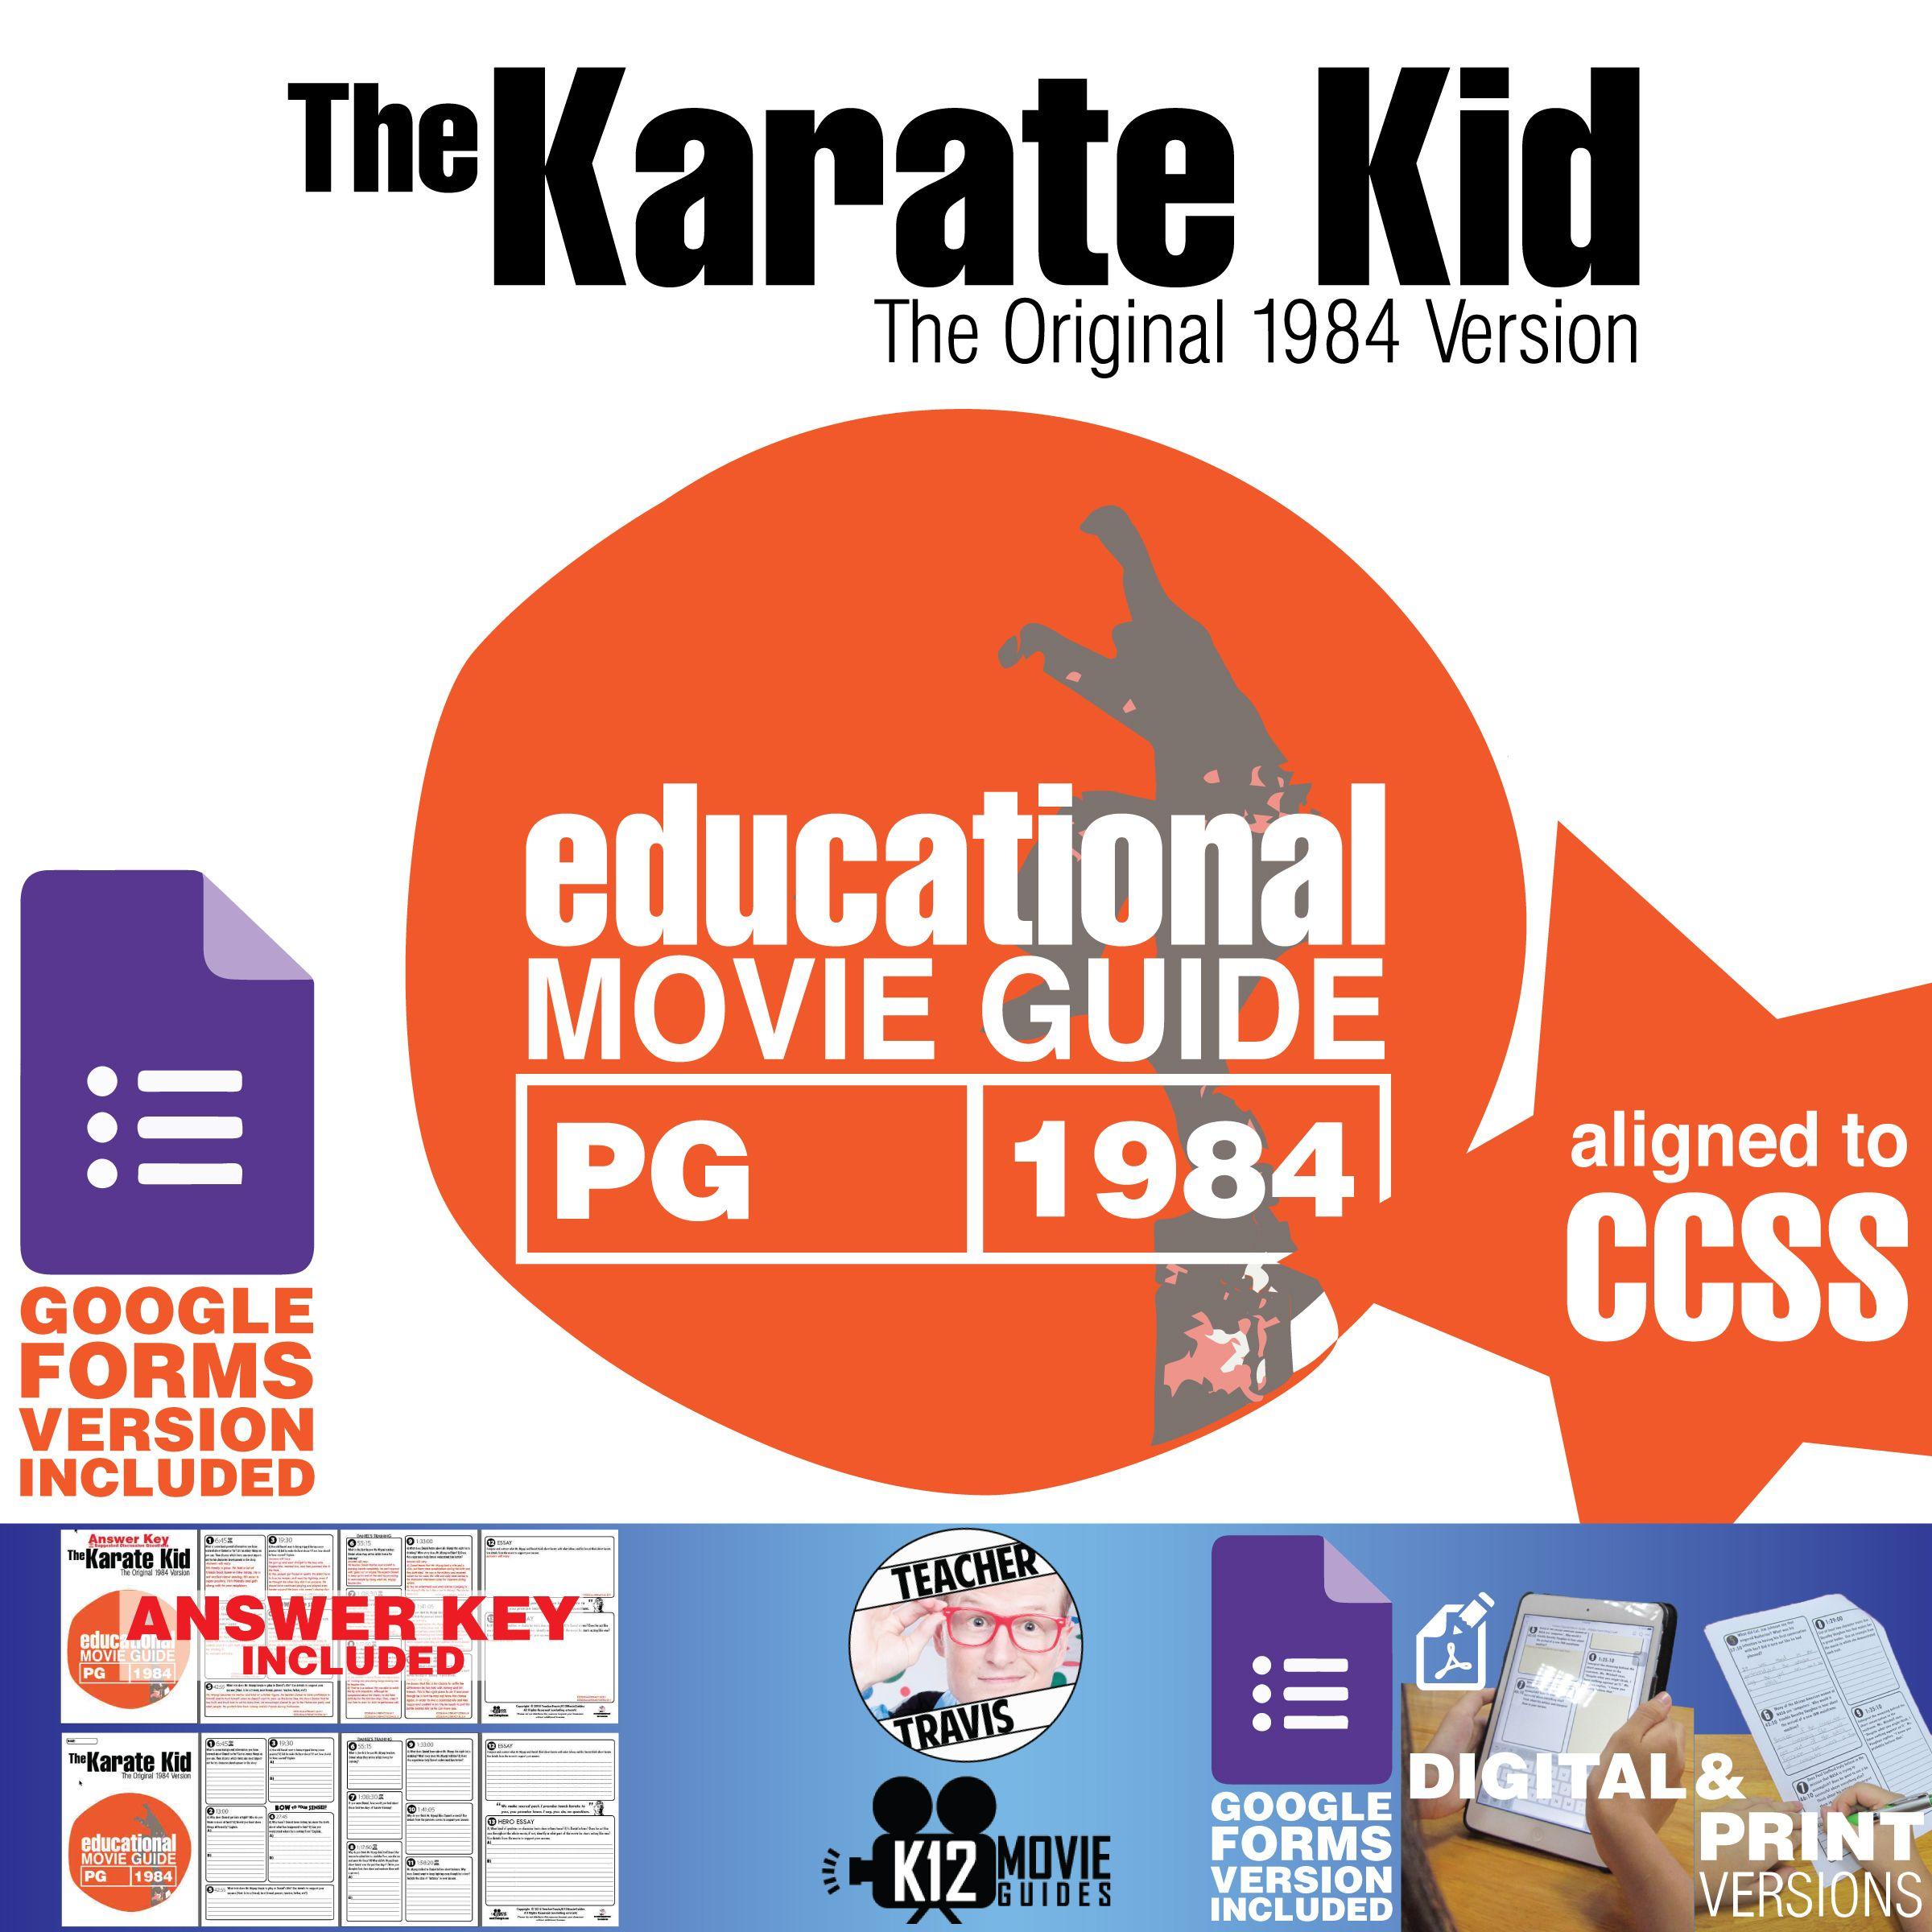 The Karate Kid Movie Guide